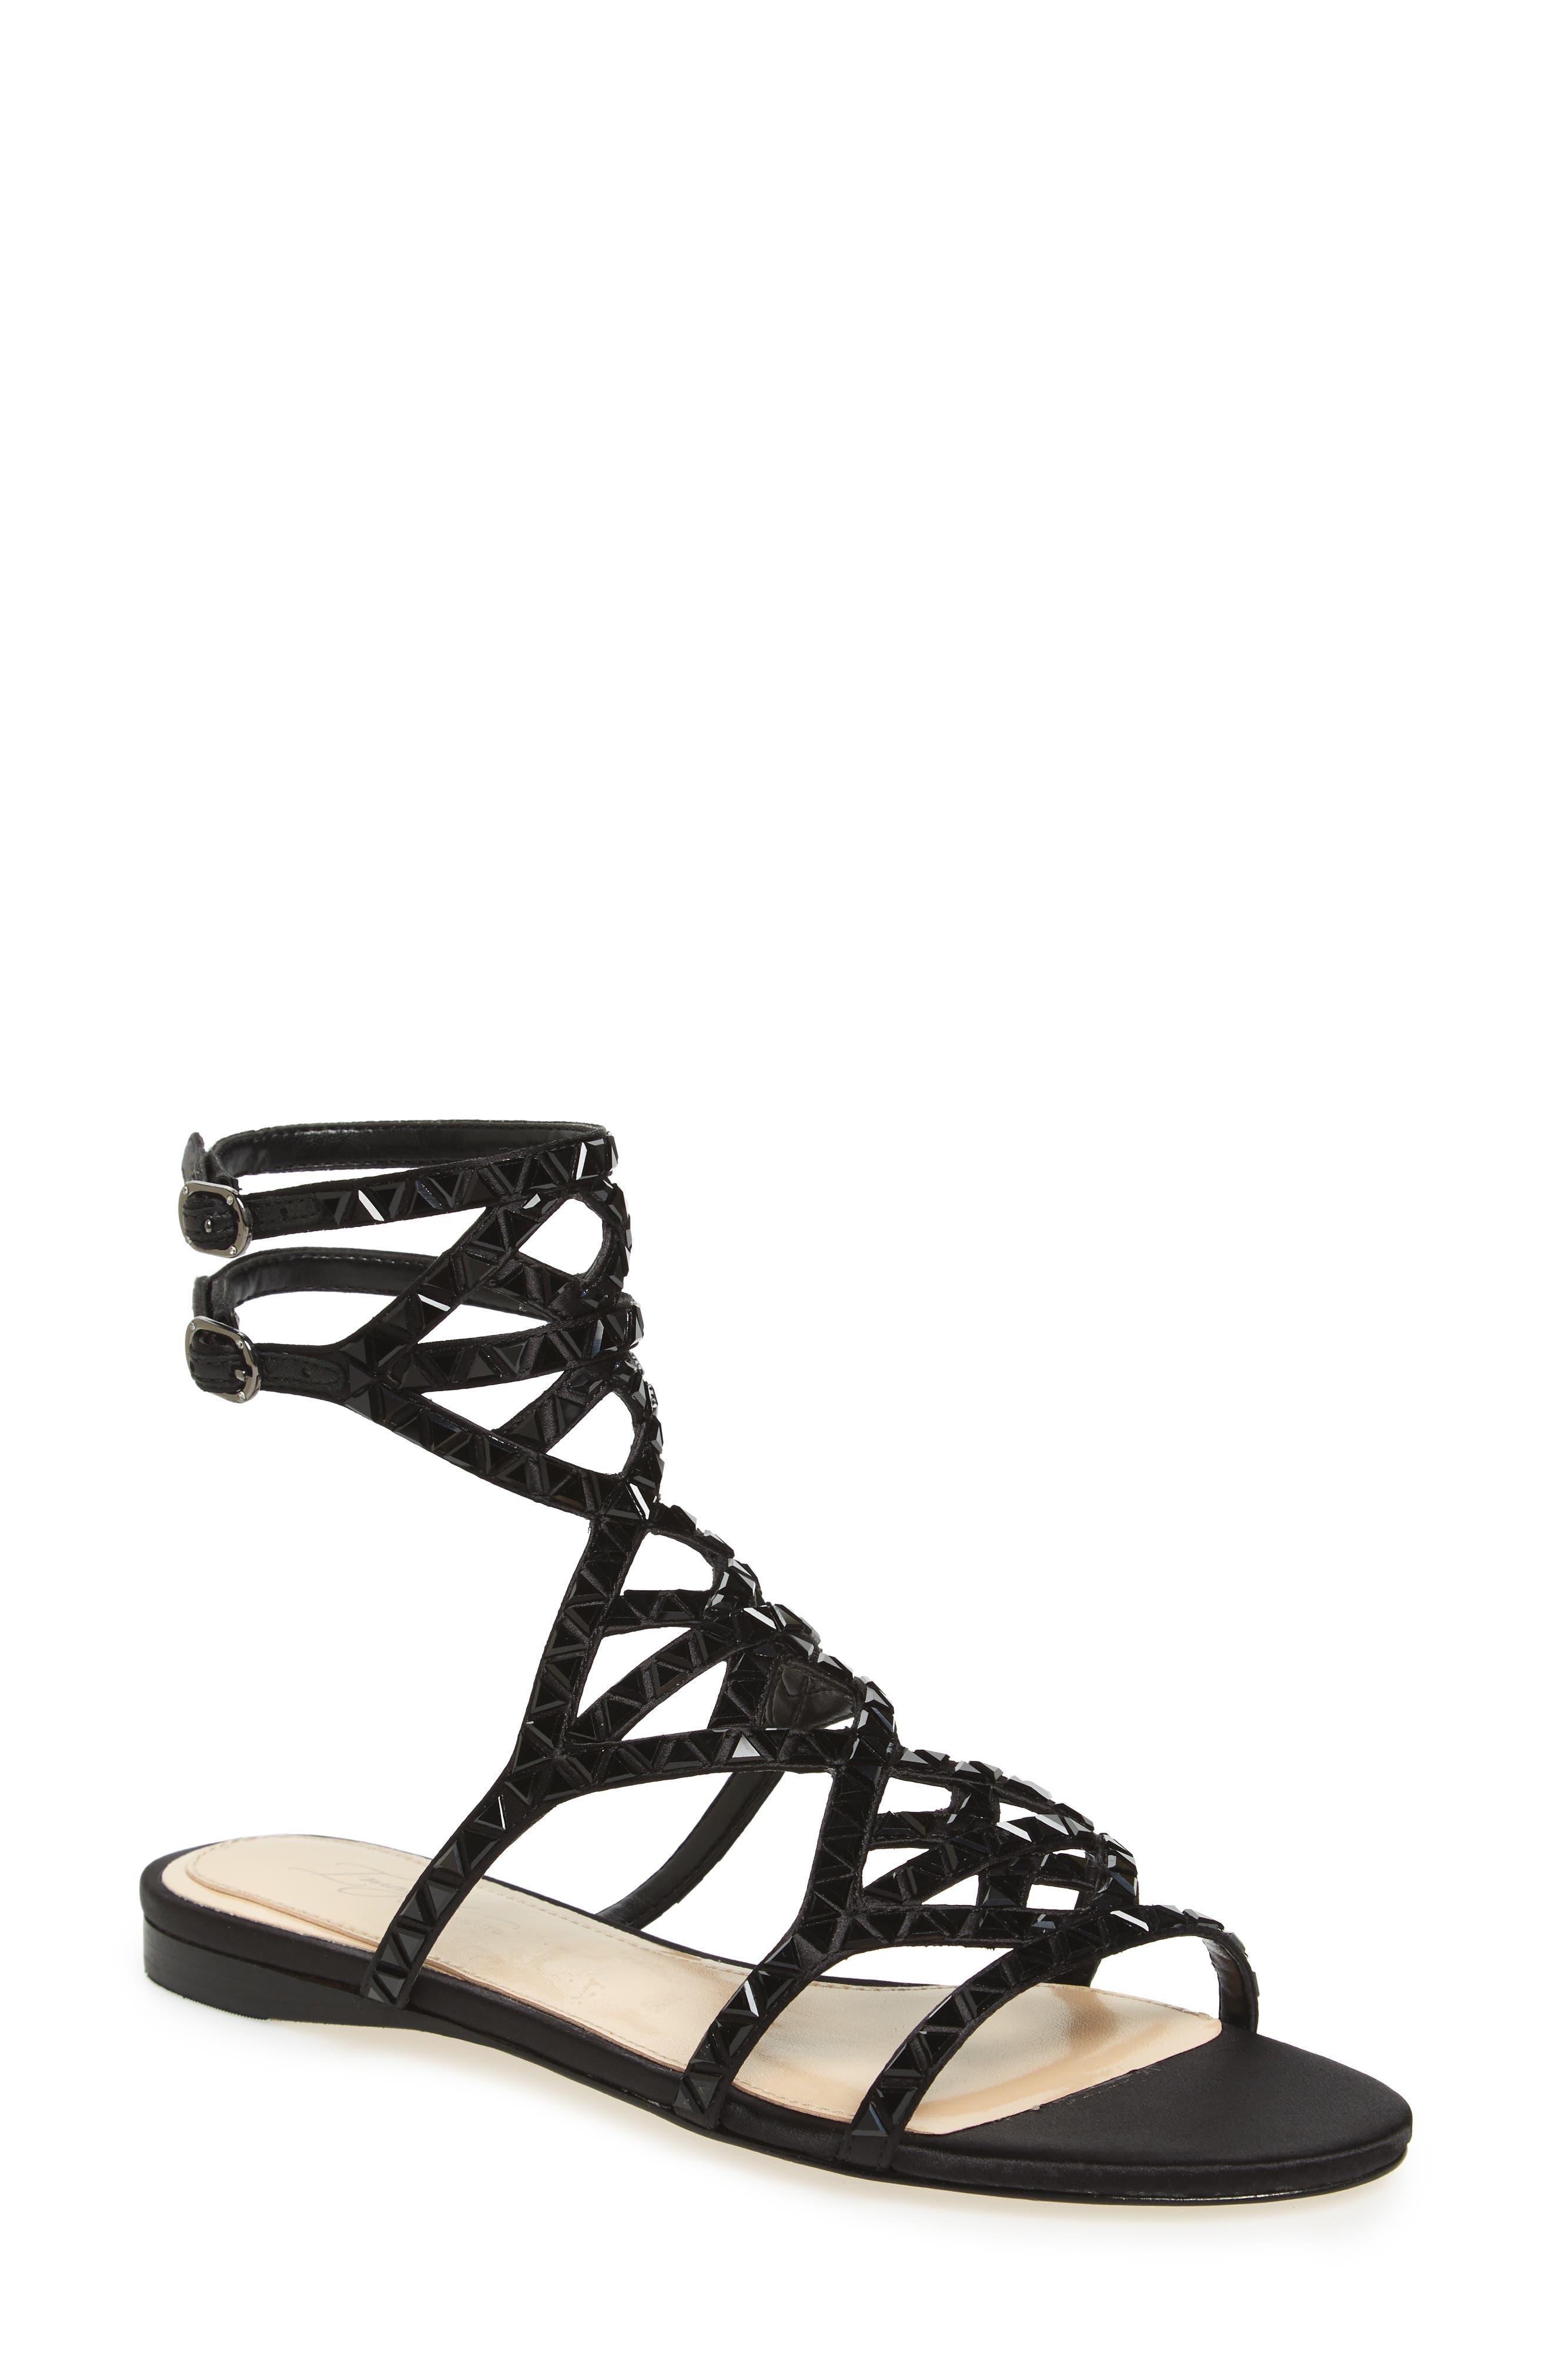 Main Image - Imagine Vince Camuto Rettle Embellished Sandal (Women)